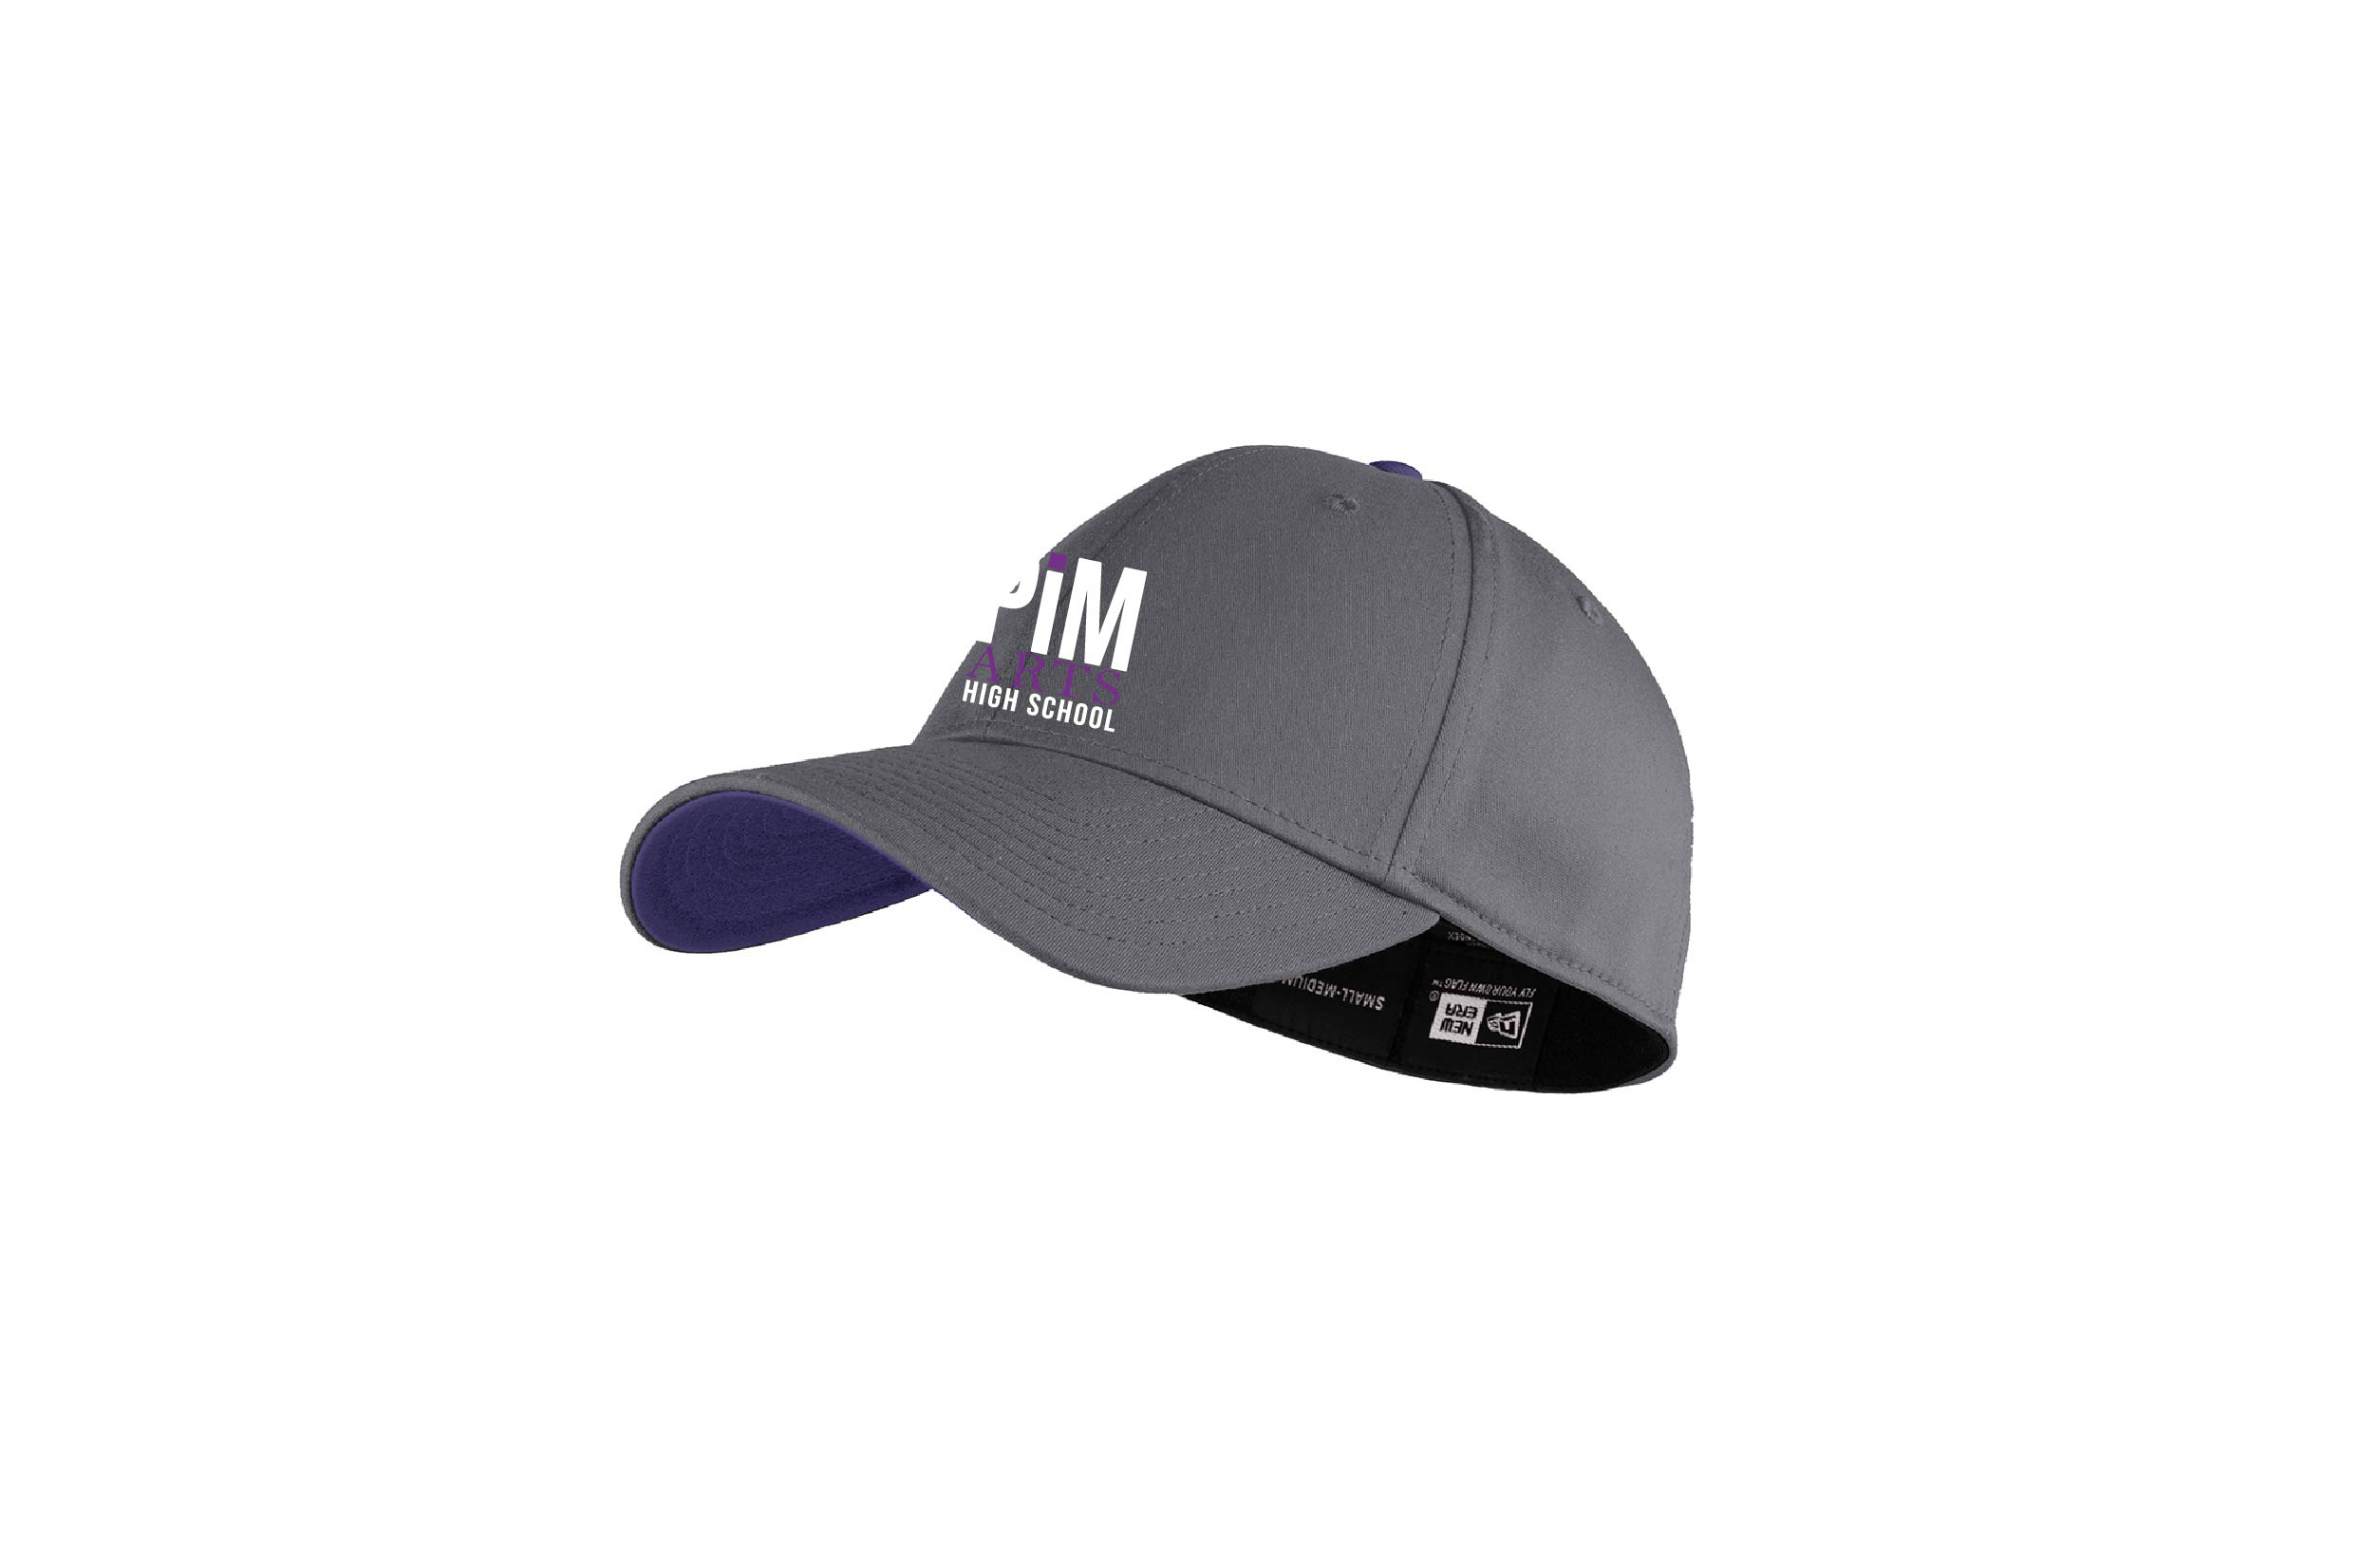 39Thirty New Era Interception Stretch Fit Cap - PiM Arts High School a67c9f0d9510